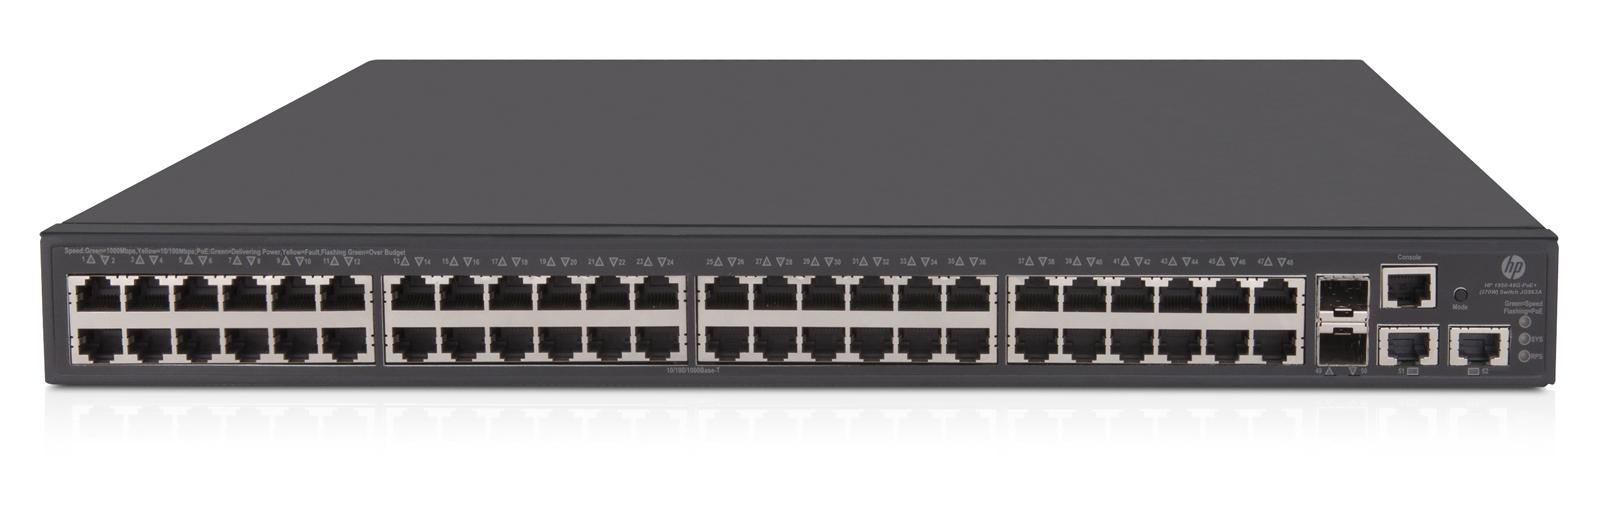 Hewlett Packard Enterprise OfficeConnect 1950 48G 2SFP+ 2XGT PoE+ + Aruba Instant On AP15 (RW) Gestionado L3 Gigabit Ethernet (10/100/1000) Gris 1U Energía sobre Ethernet (PoE)